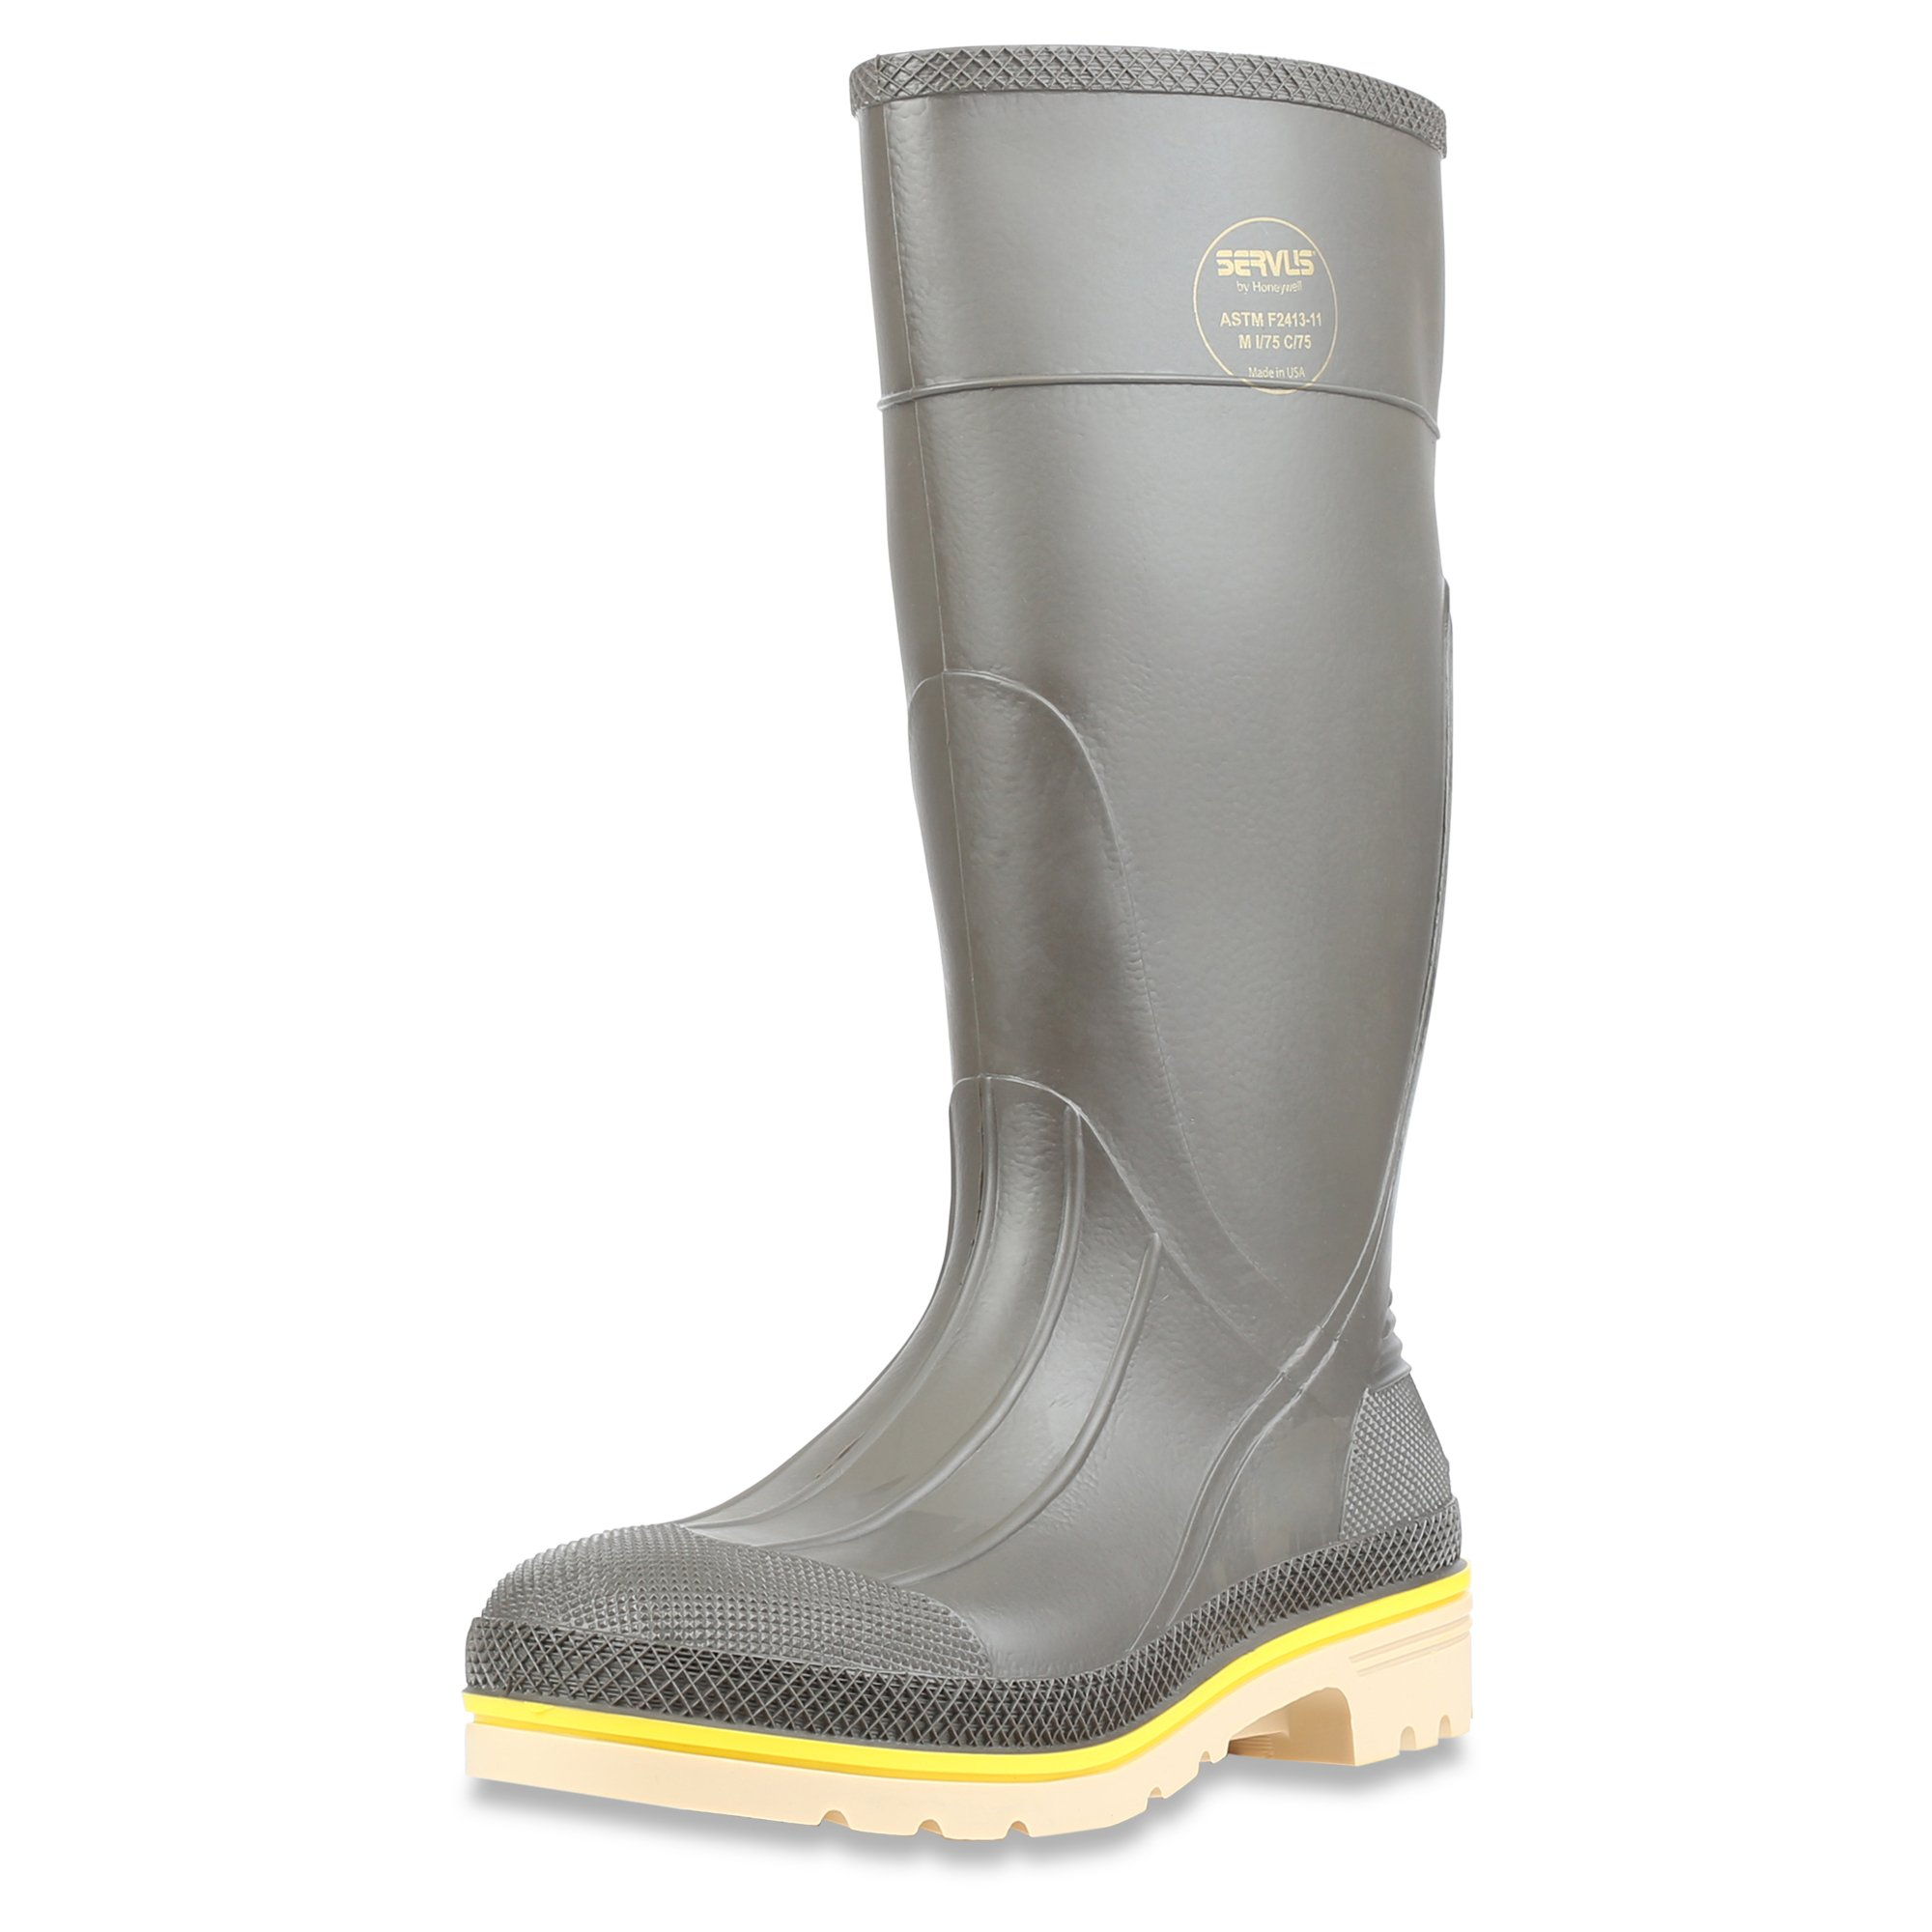 "Servus Pro+ 15"" PVC Chemical-Resistant Steel Toe"